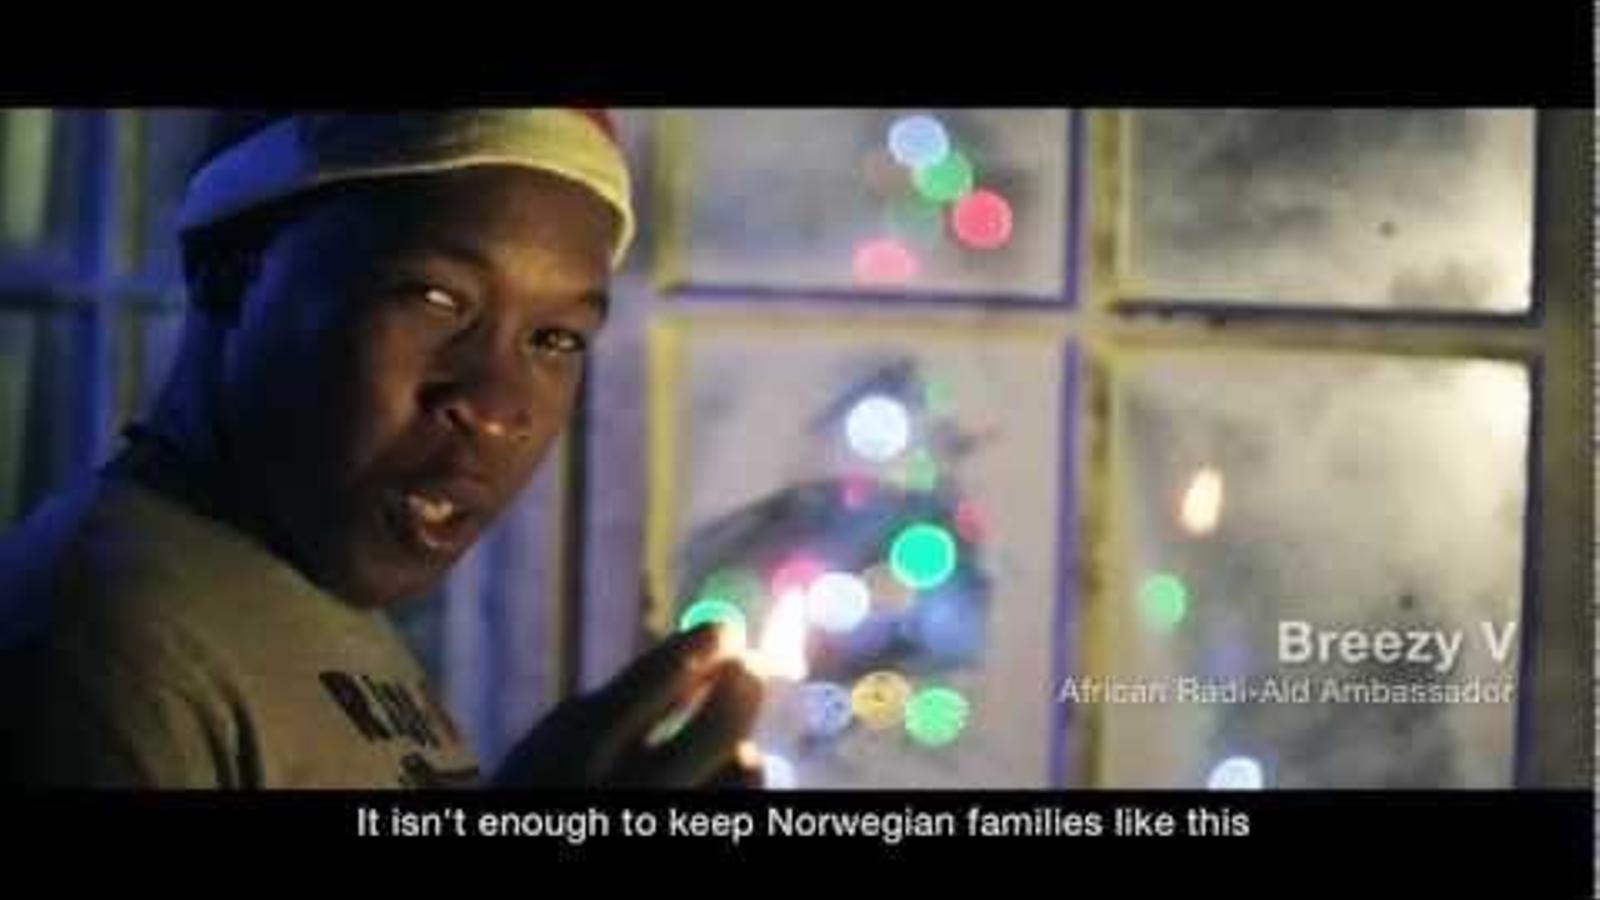 Campanya noruega per africa